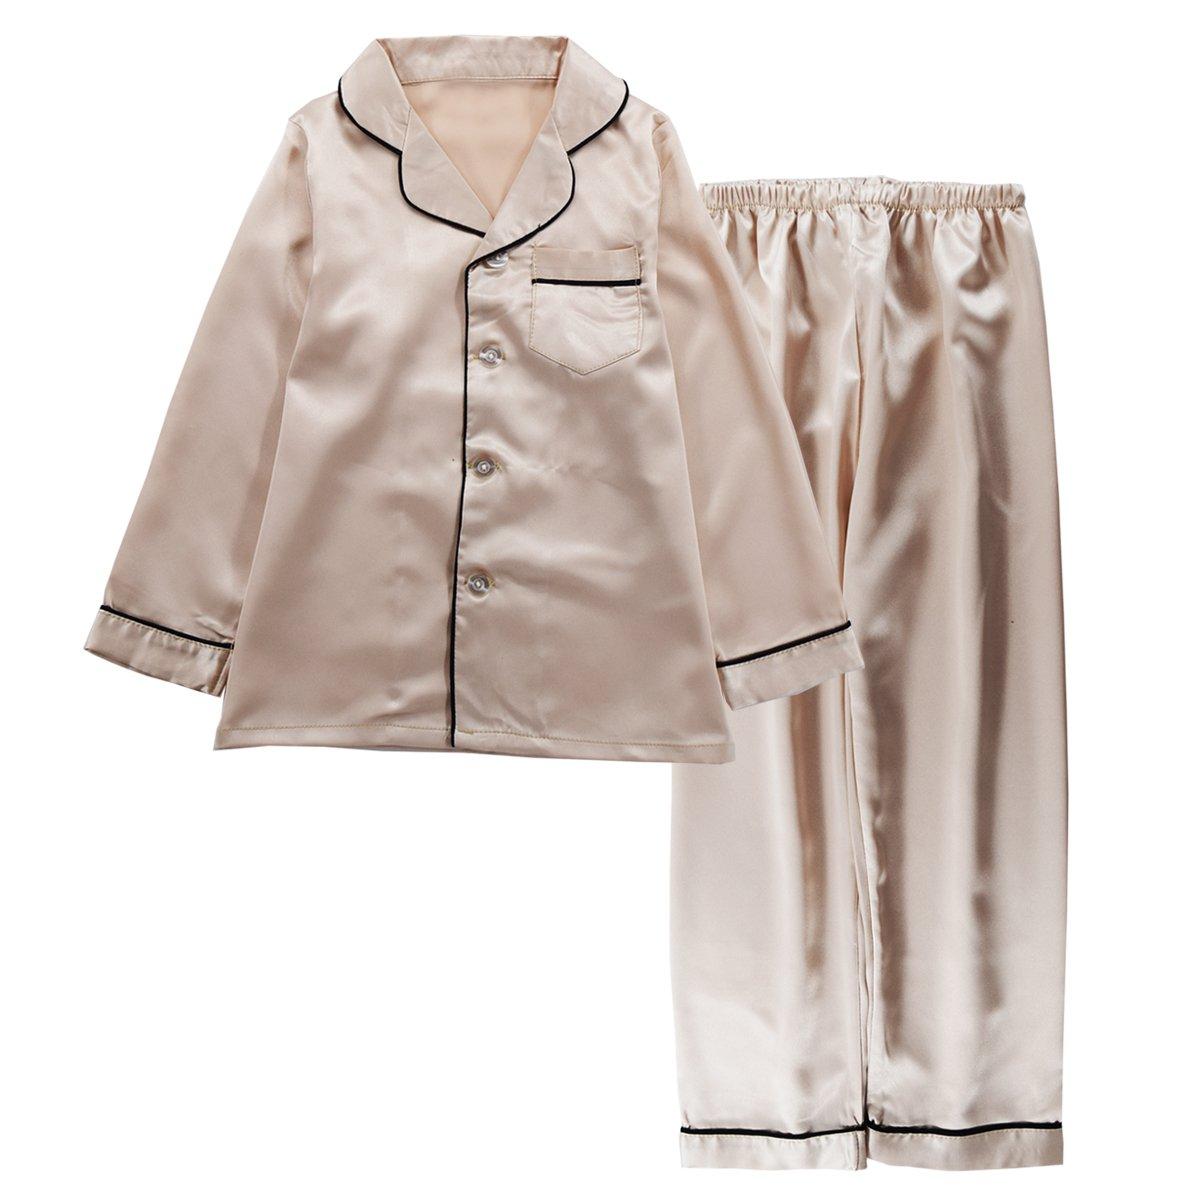 JOYTTON Kids Satin Pajamas Set PJS Long Sleeve Sleepwear Loungewear Champagne